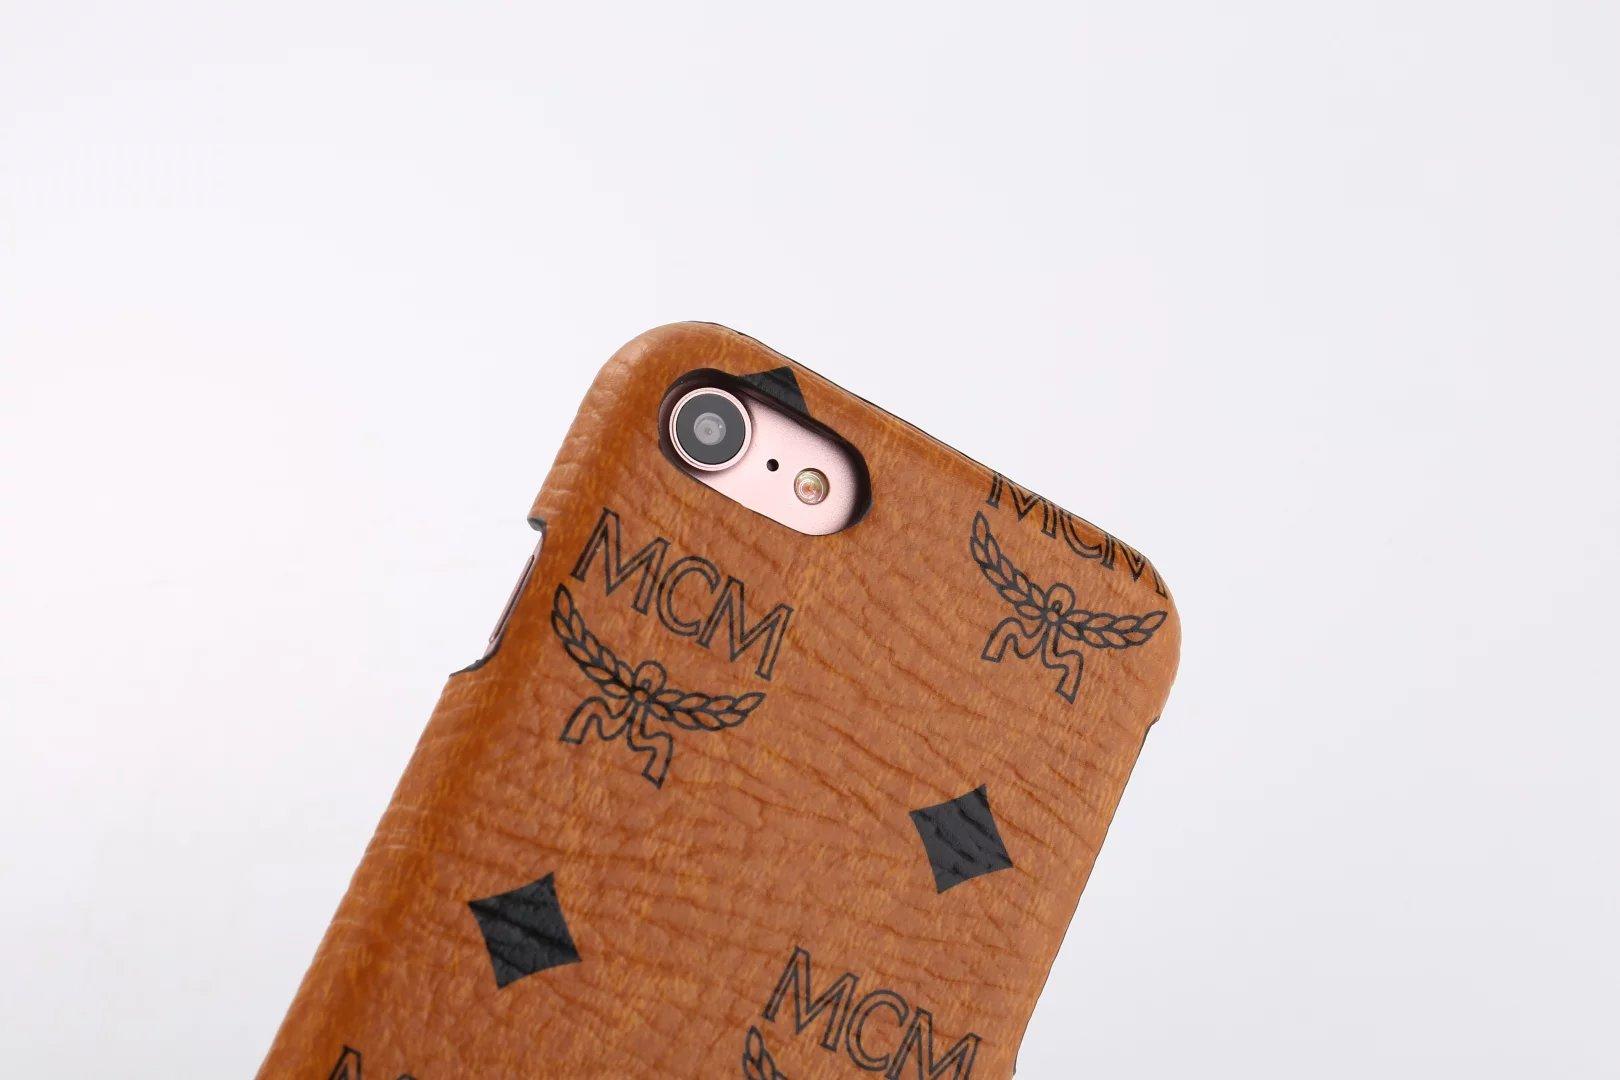 case for apple iphone 7 Plus apple iphone cases for 7 Plus fashion iphone7 Plus case iphone 7 Plusases designer iphone case price iphone 7 Plus case cost cheap iphone 7 Plus covers buy designer black iphone 7 Plus cover